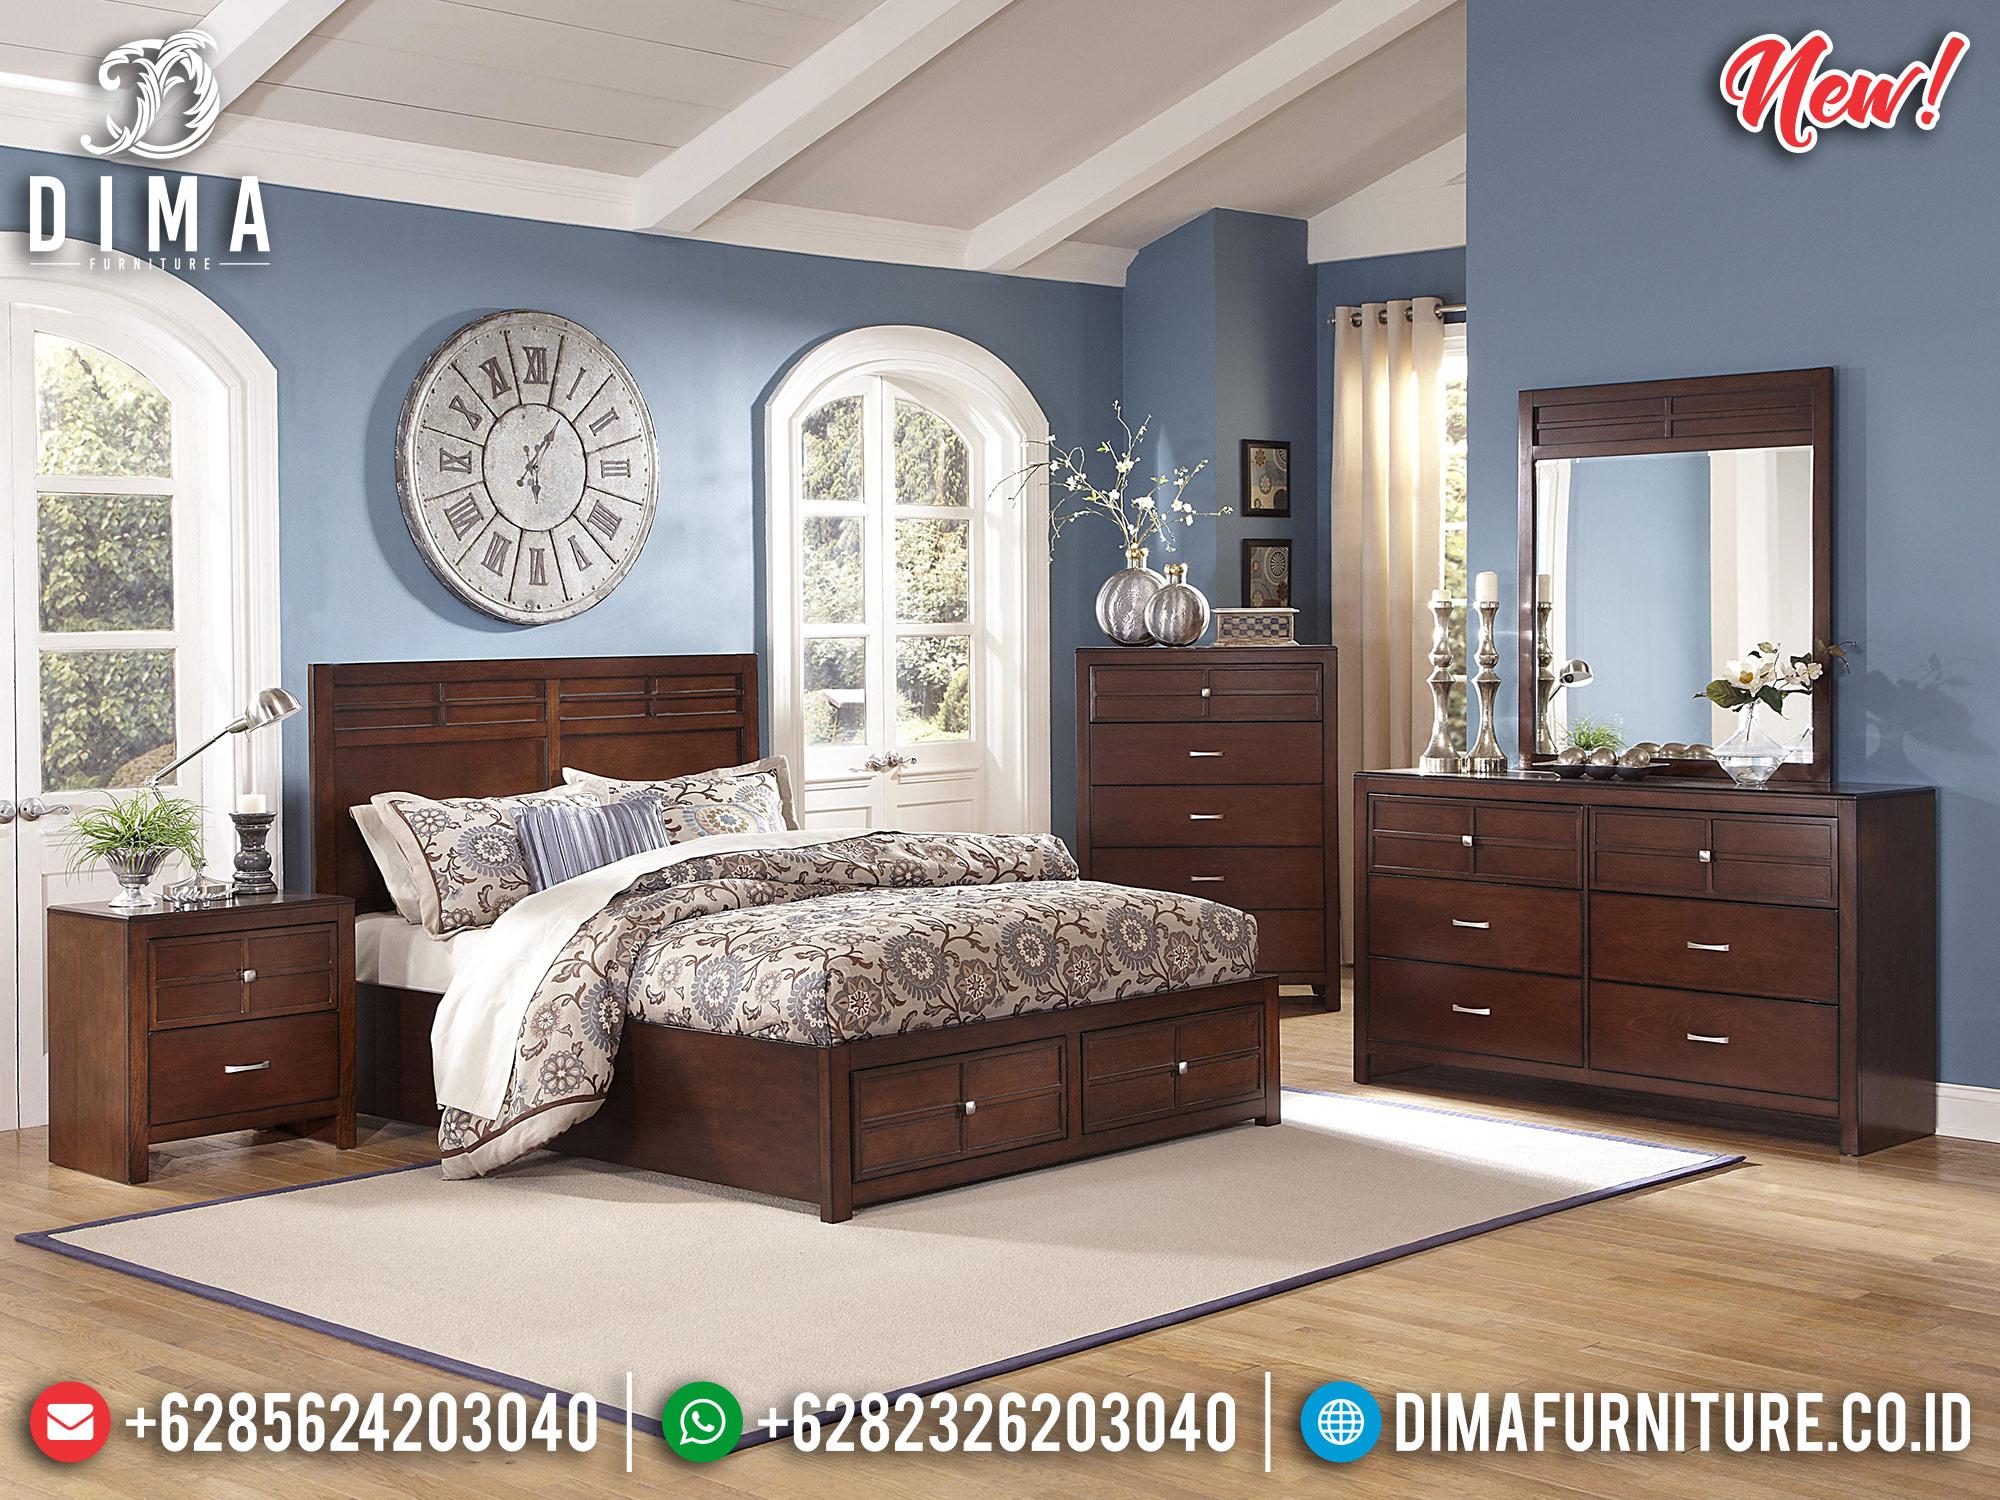 Jual Tempat Tidur Minimalis Jati Jepara TTJ-0003